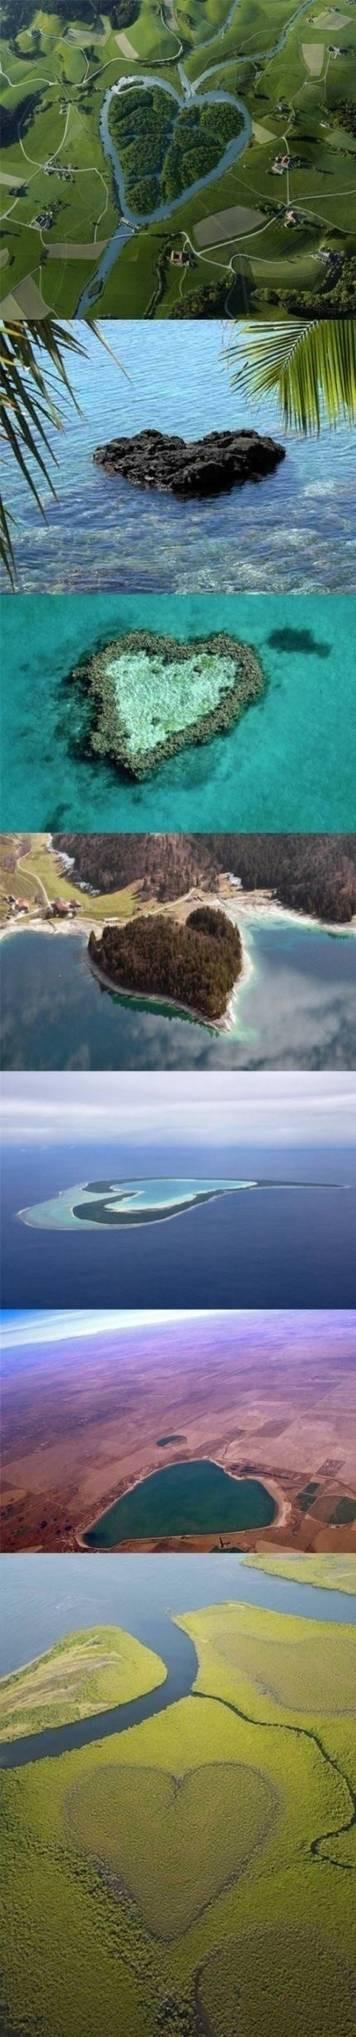 7 Kenampakan Alam Berbentuk Hati